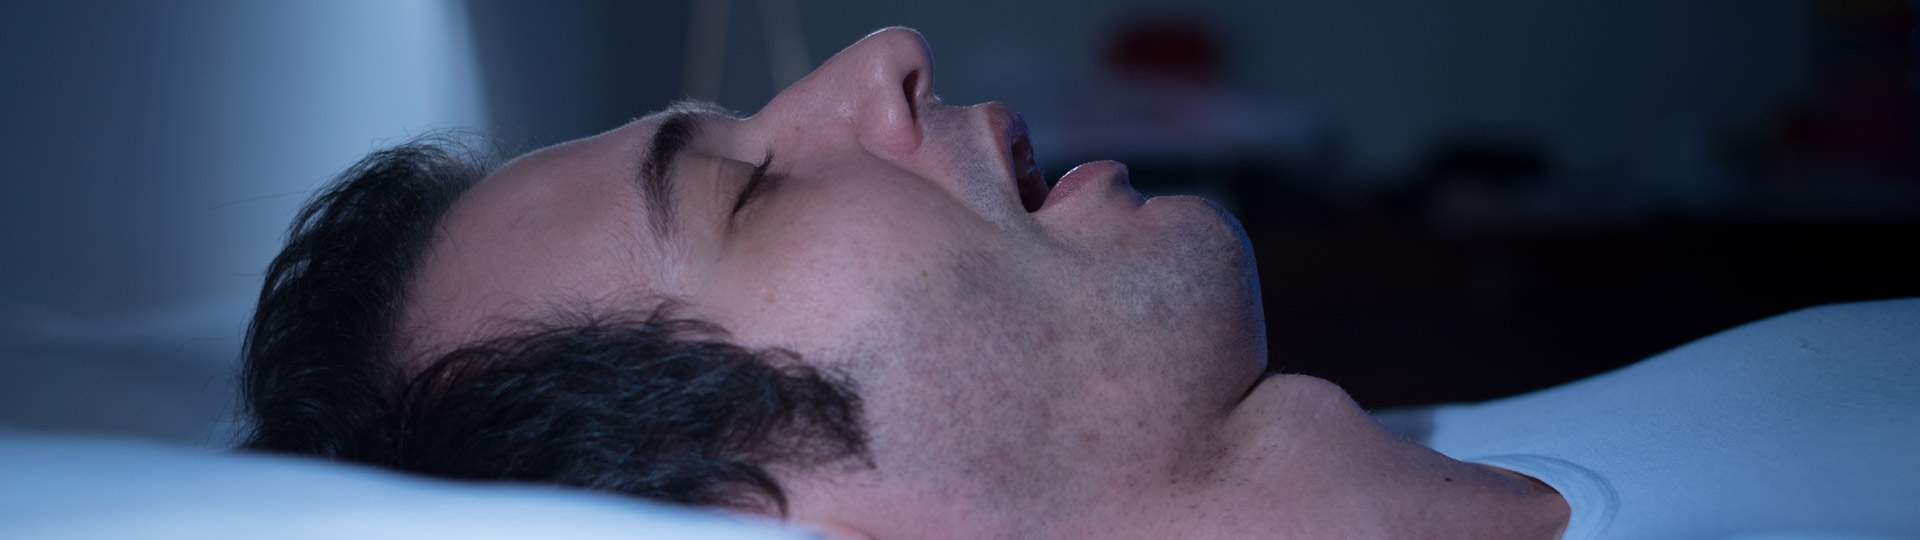 5 Alternative Sleep Apnea Treatment Options